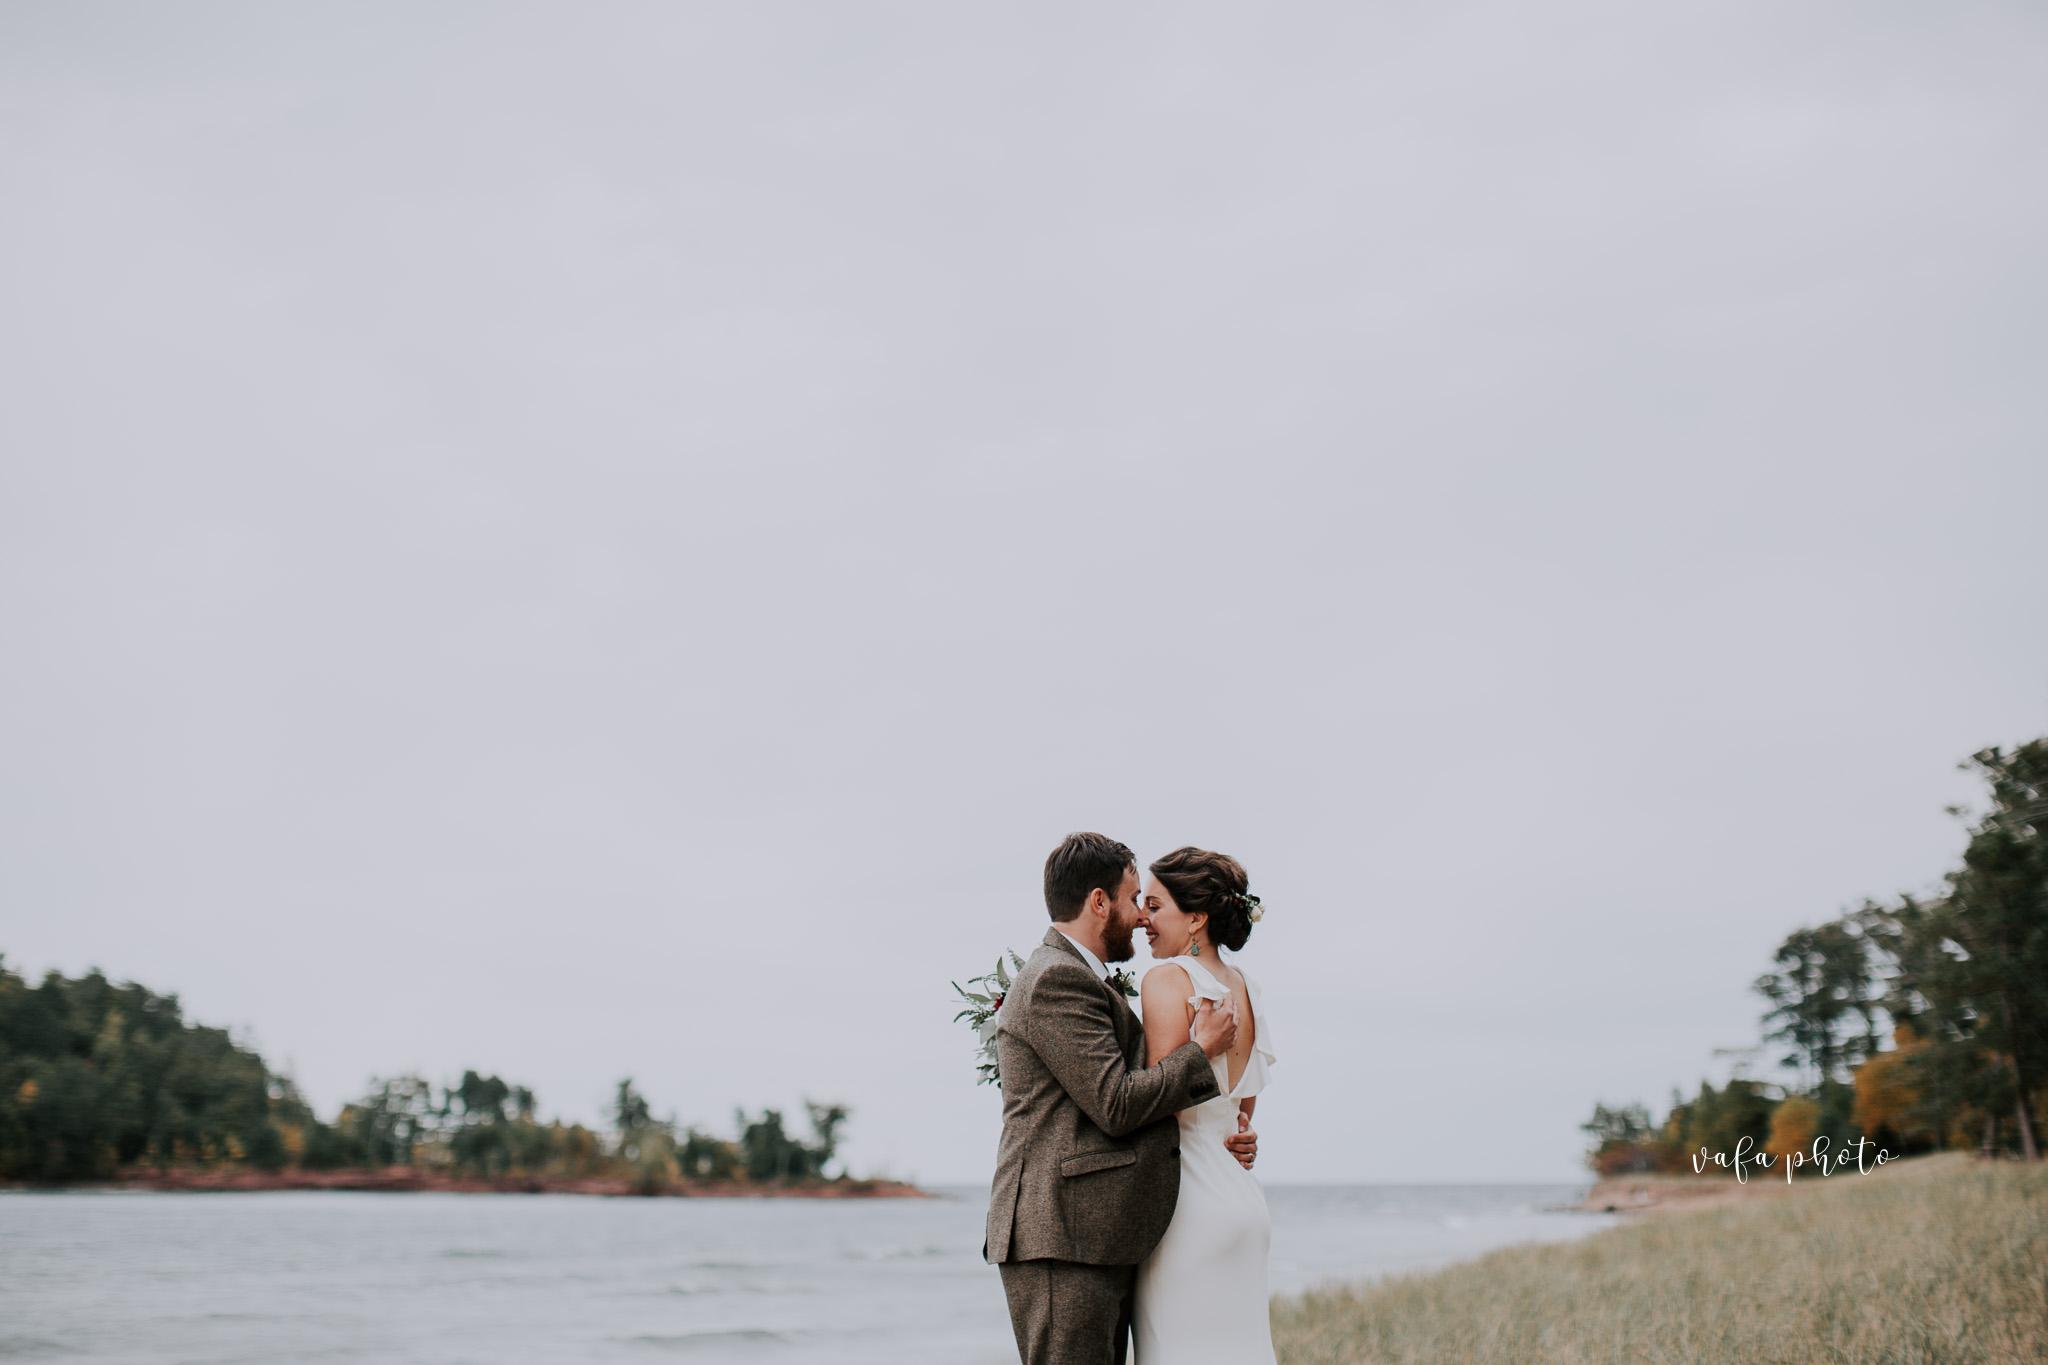 Little-Presque-Isle-Michigan-Wedding-Kim-Kyle-Vafa-Photo-453.jpg